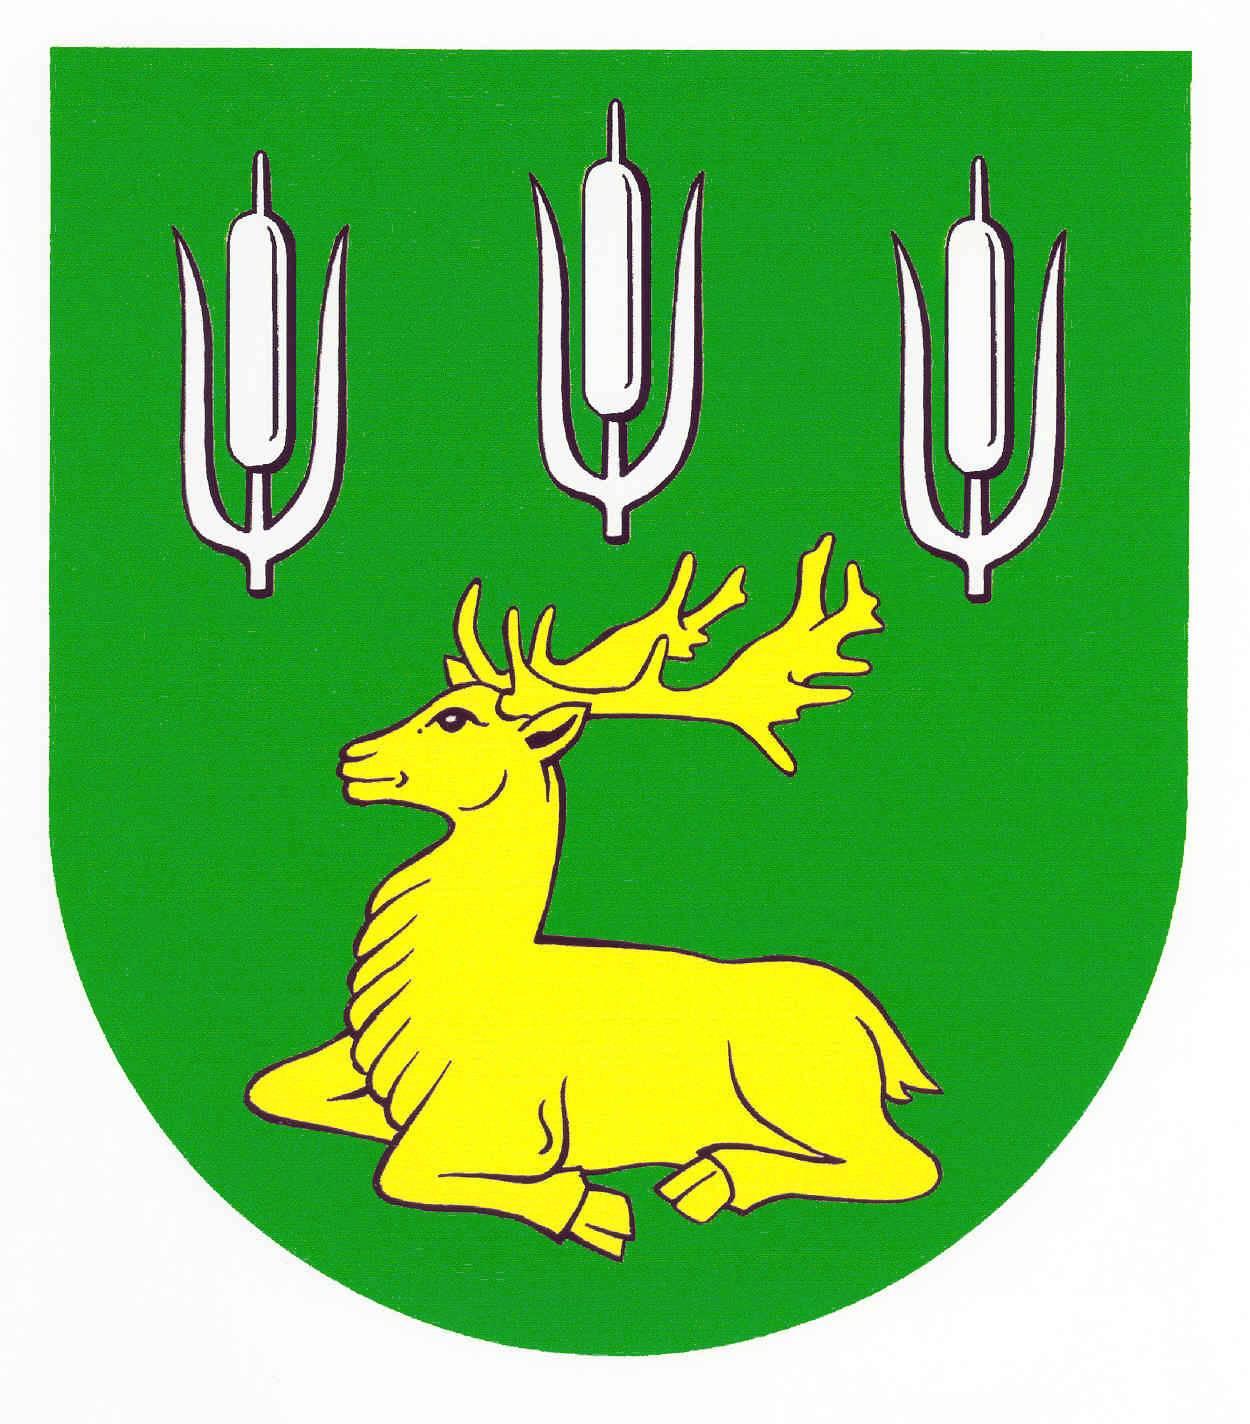 Wappen GemeindeHaßmoor, Kreis Rendsburg-Eckernförde